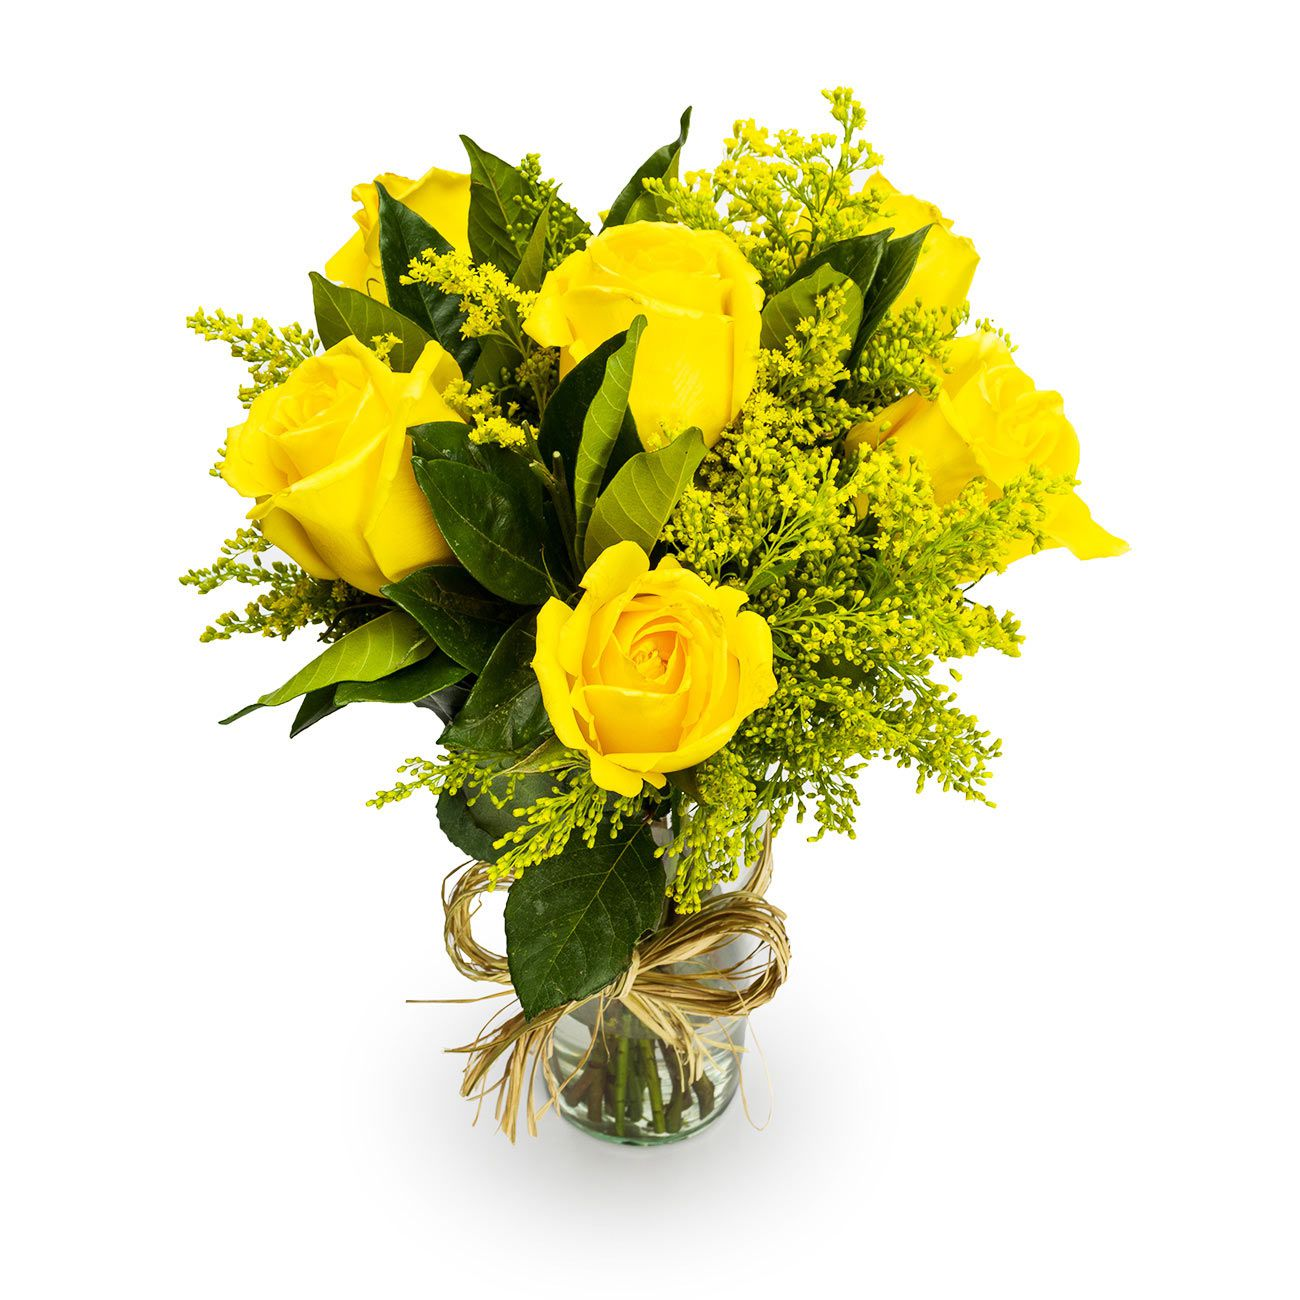 6 Rosas Amarelas no vidro